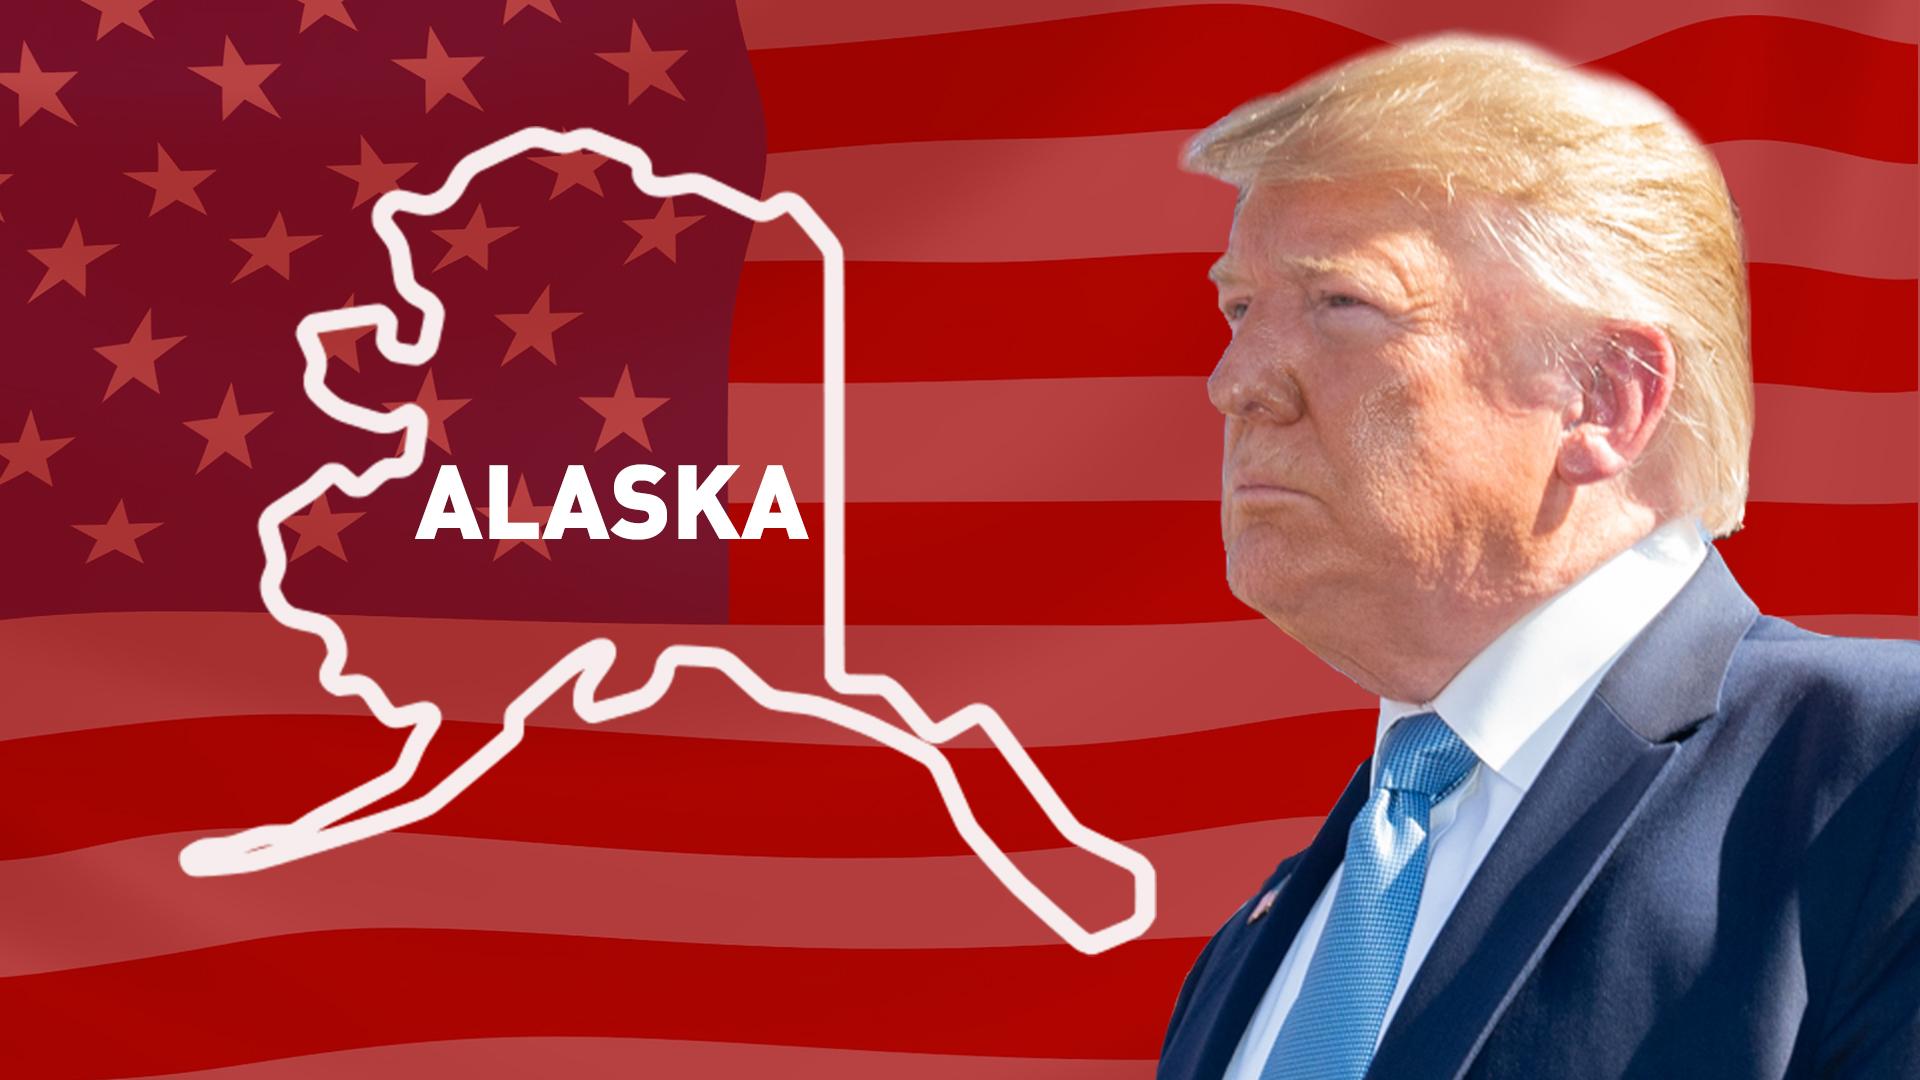 IMAGEM: Trump vence no Alaska